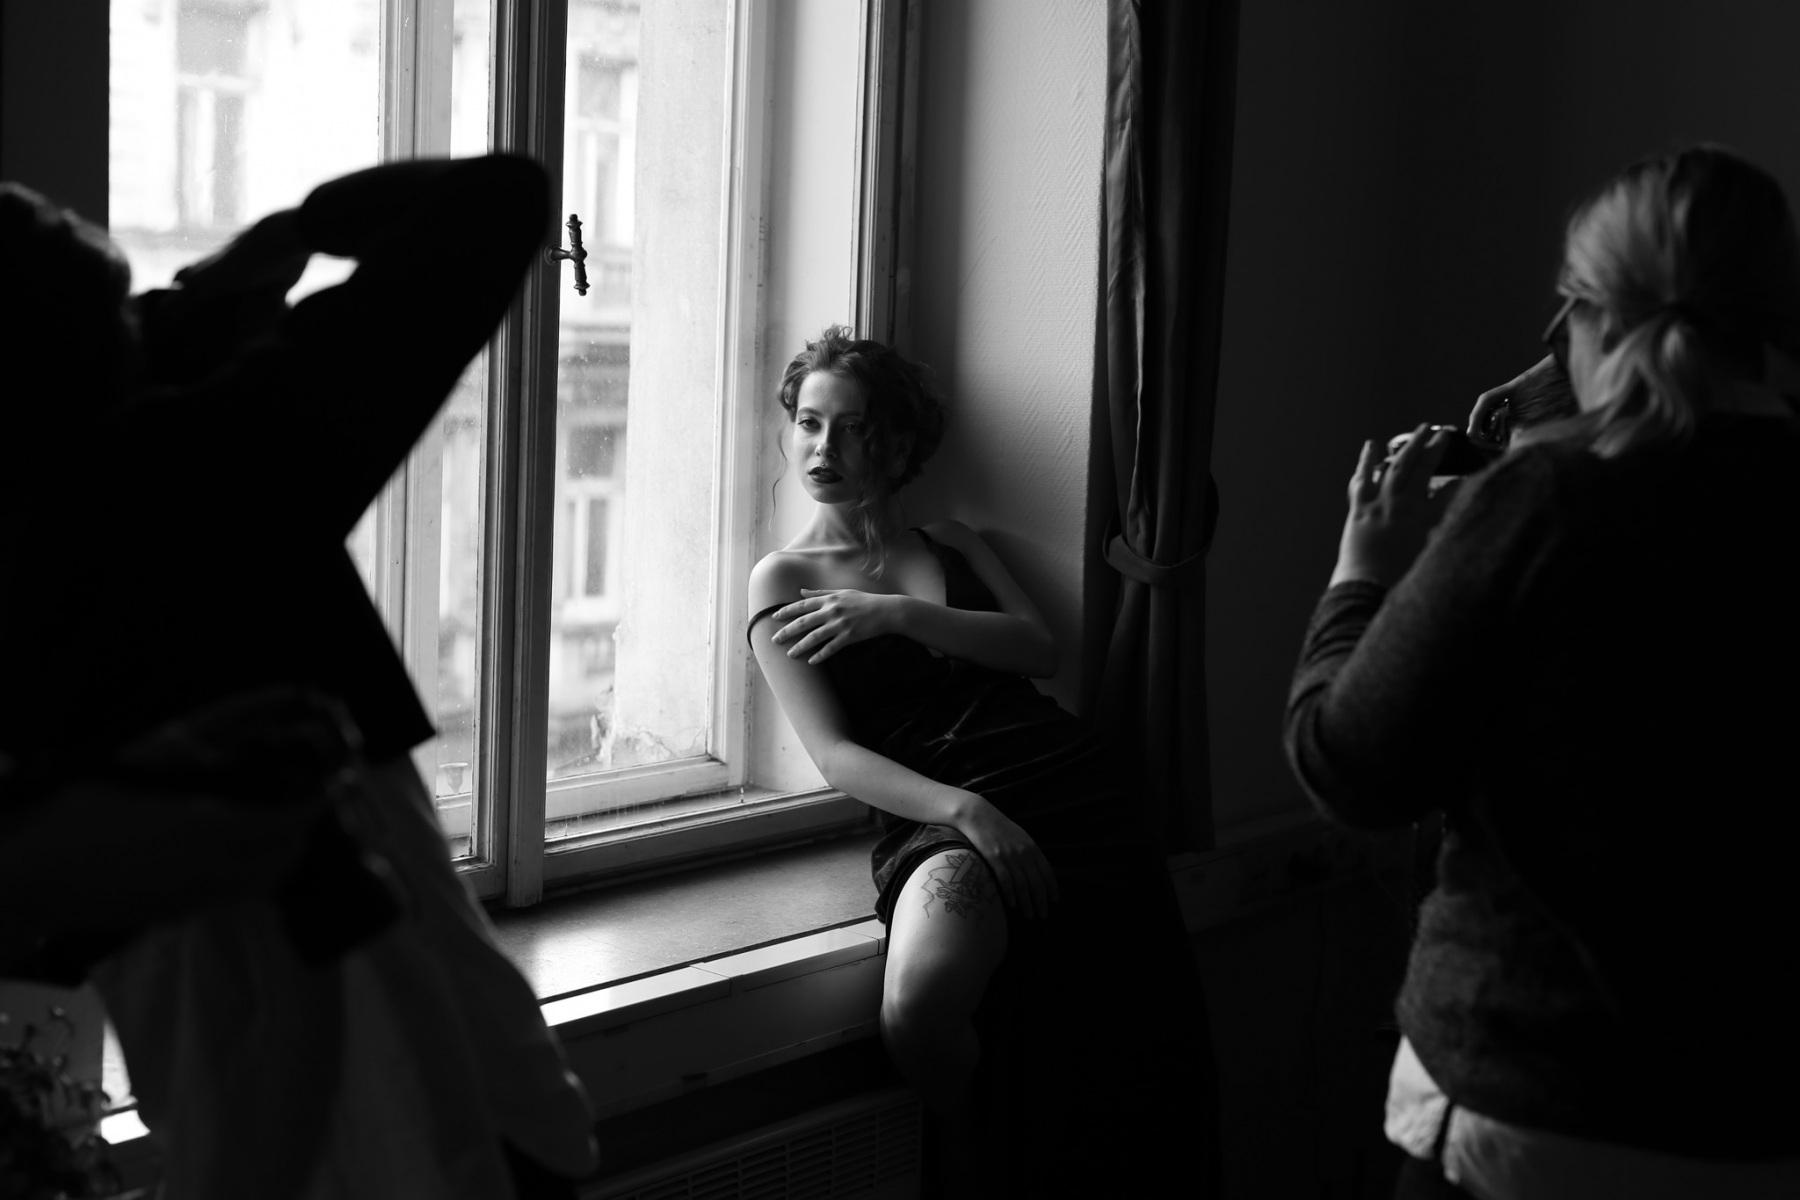 Katerina_Janisova_Masterclass_Workshop_Fotokurz-3